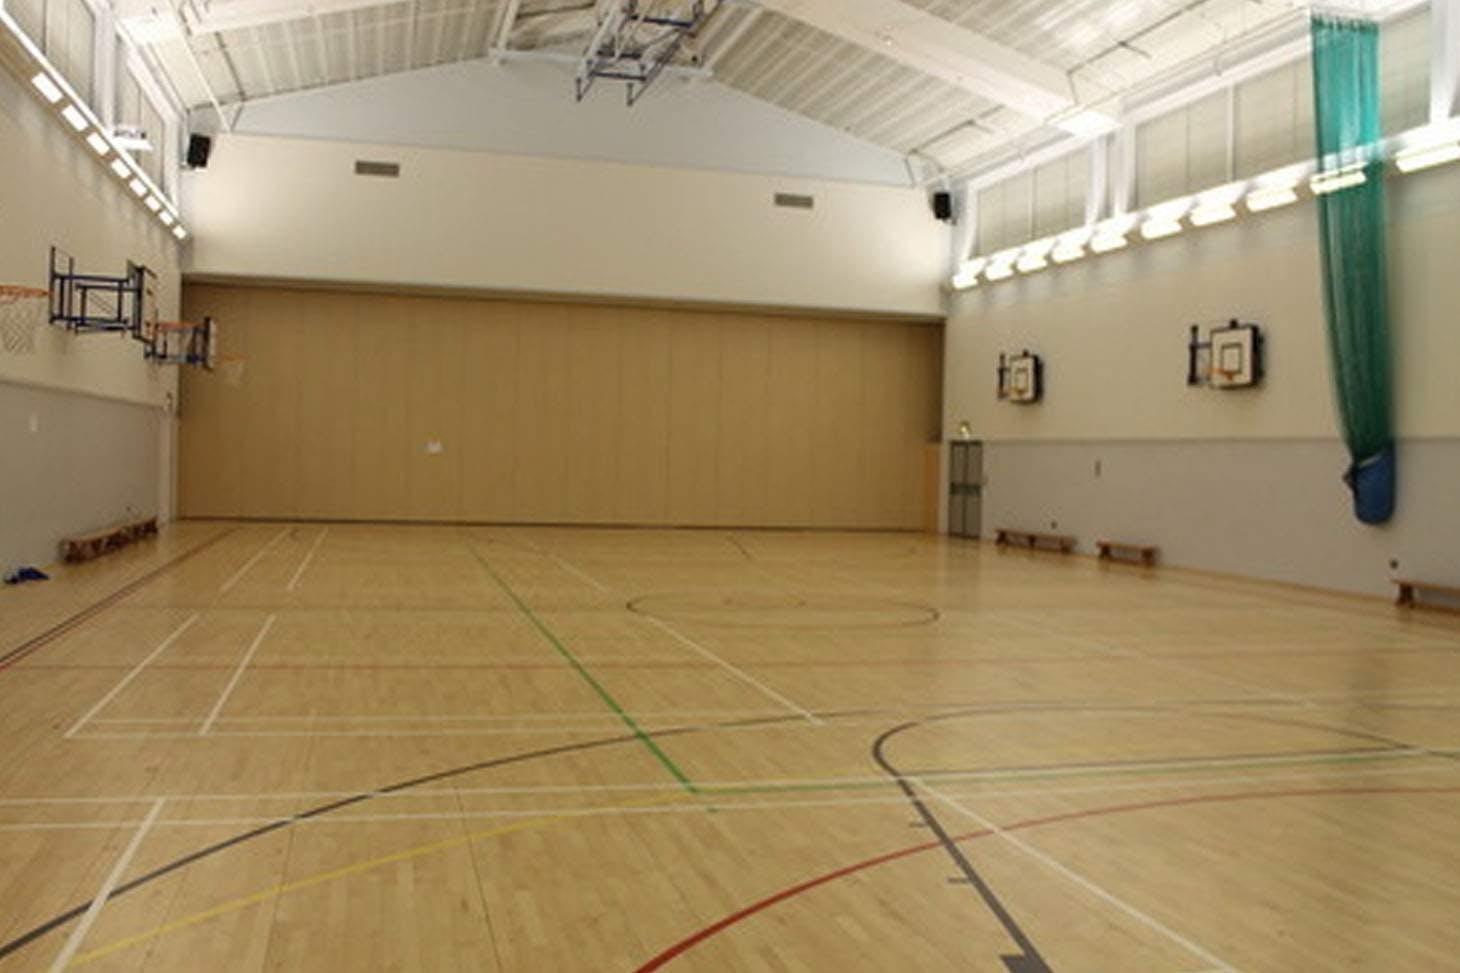 Whitburn C of E Academy Indoor netball court